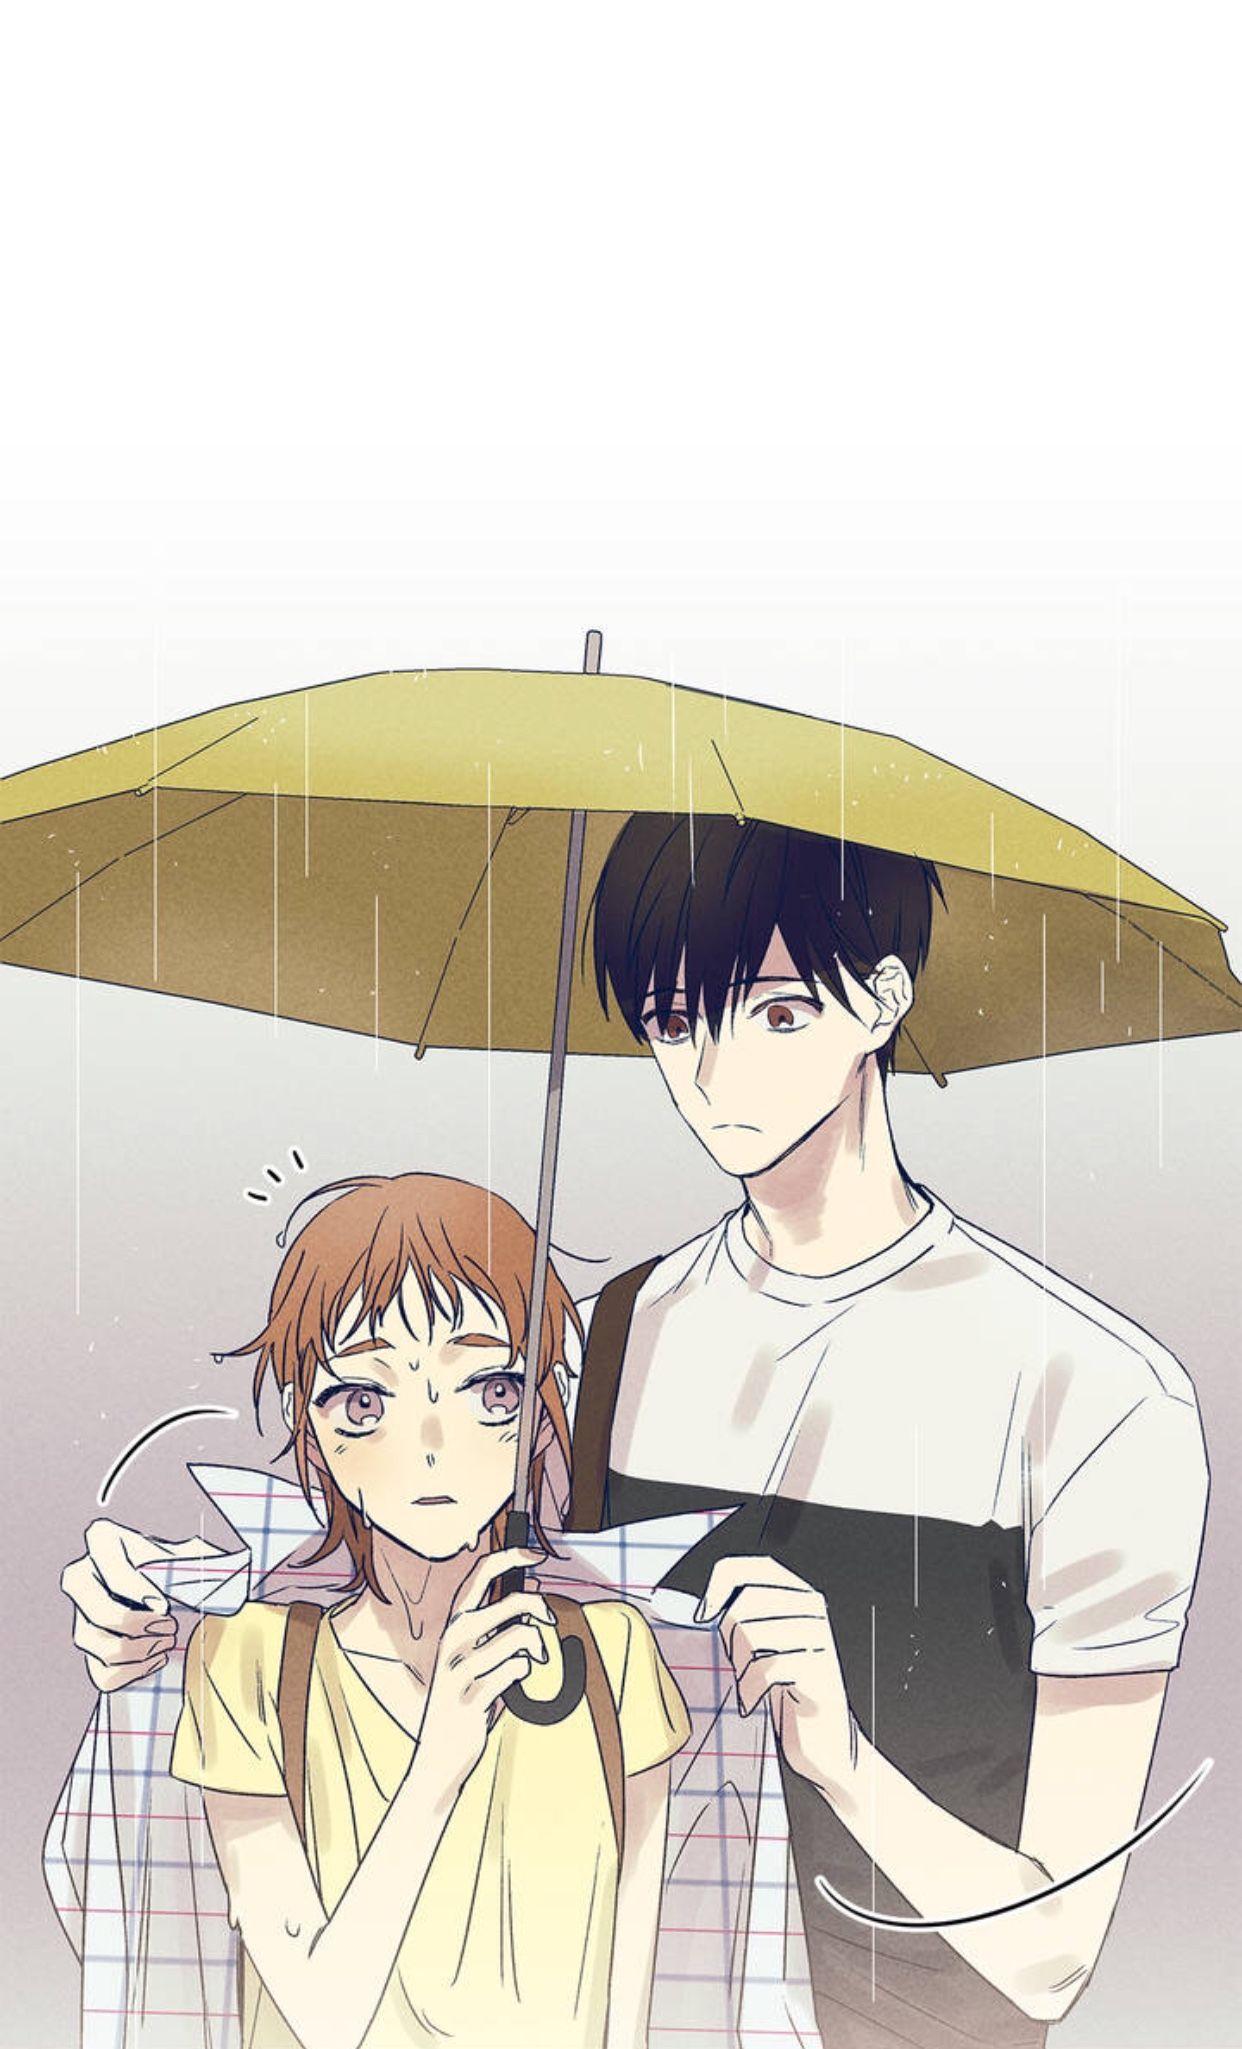 Pin by rachel on ships ahoy. Manga, Anime, Webtoon